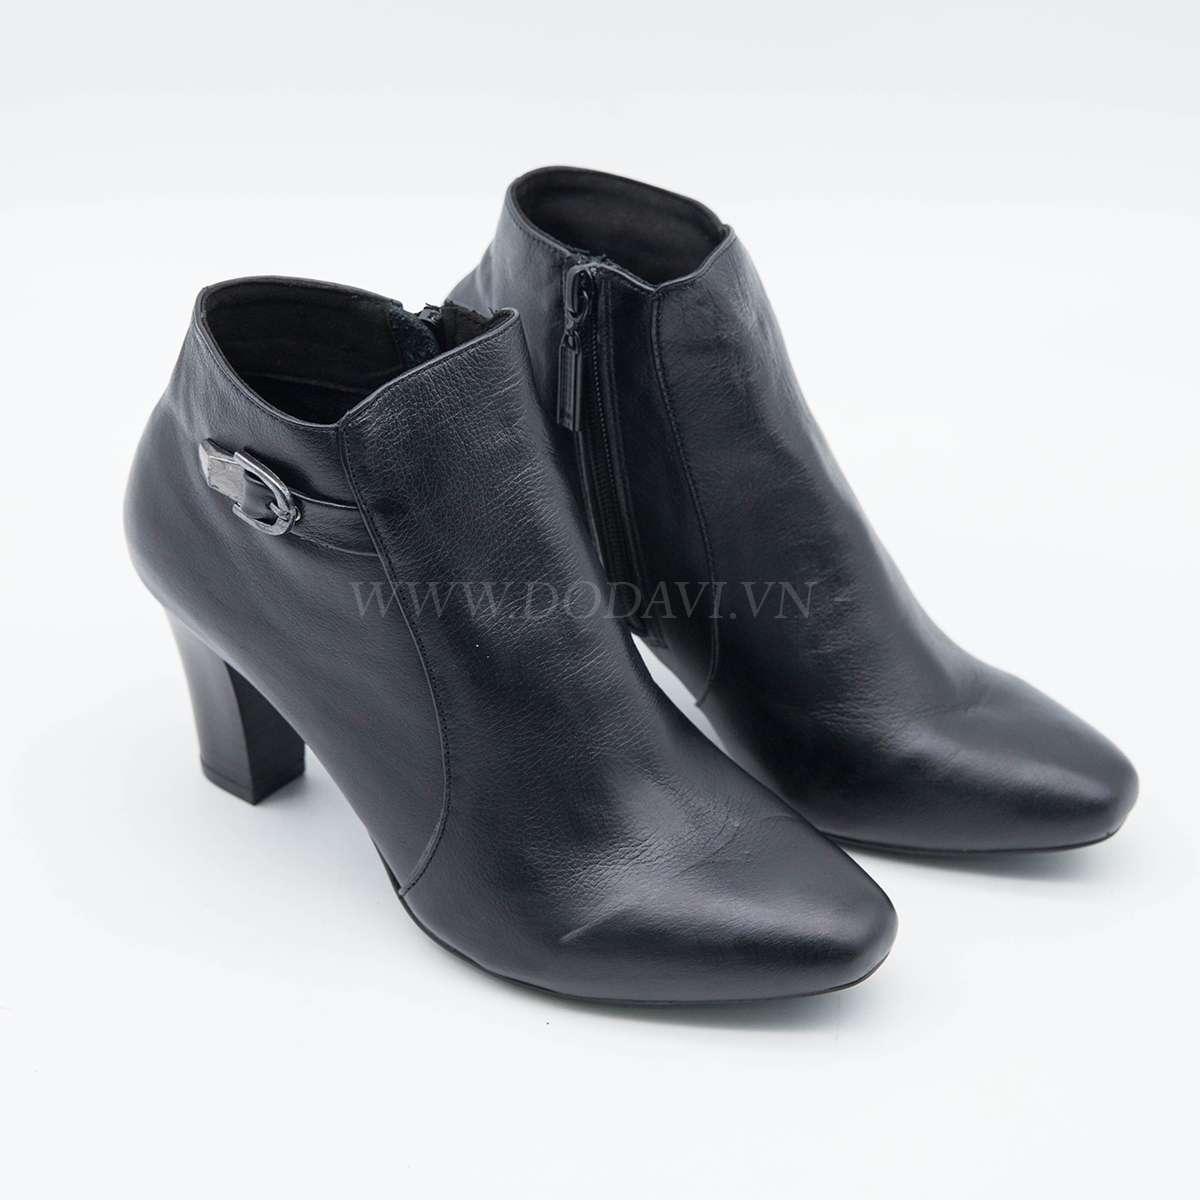 Giày nam 2060-3012.41